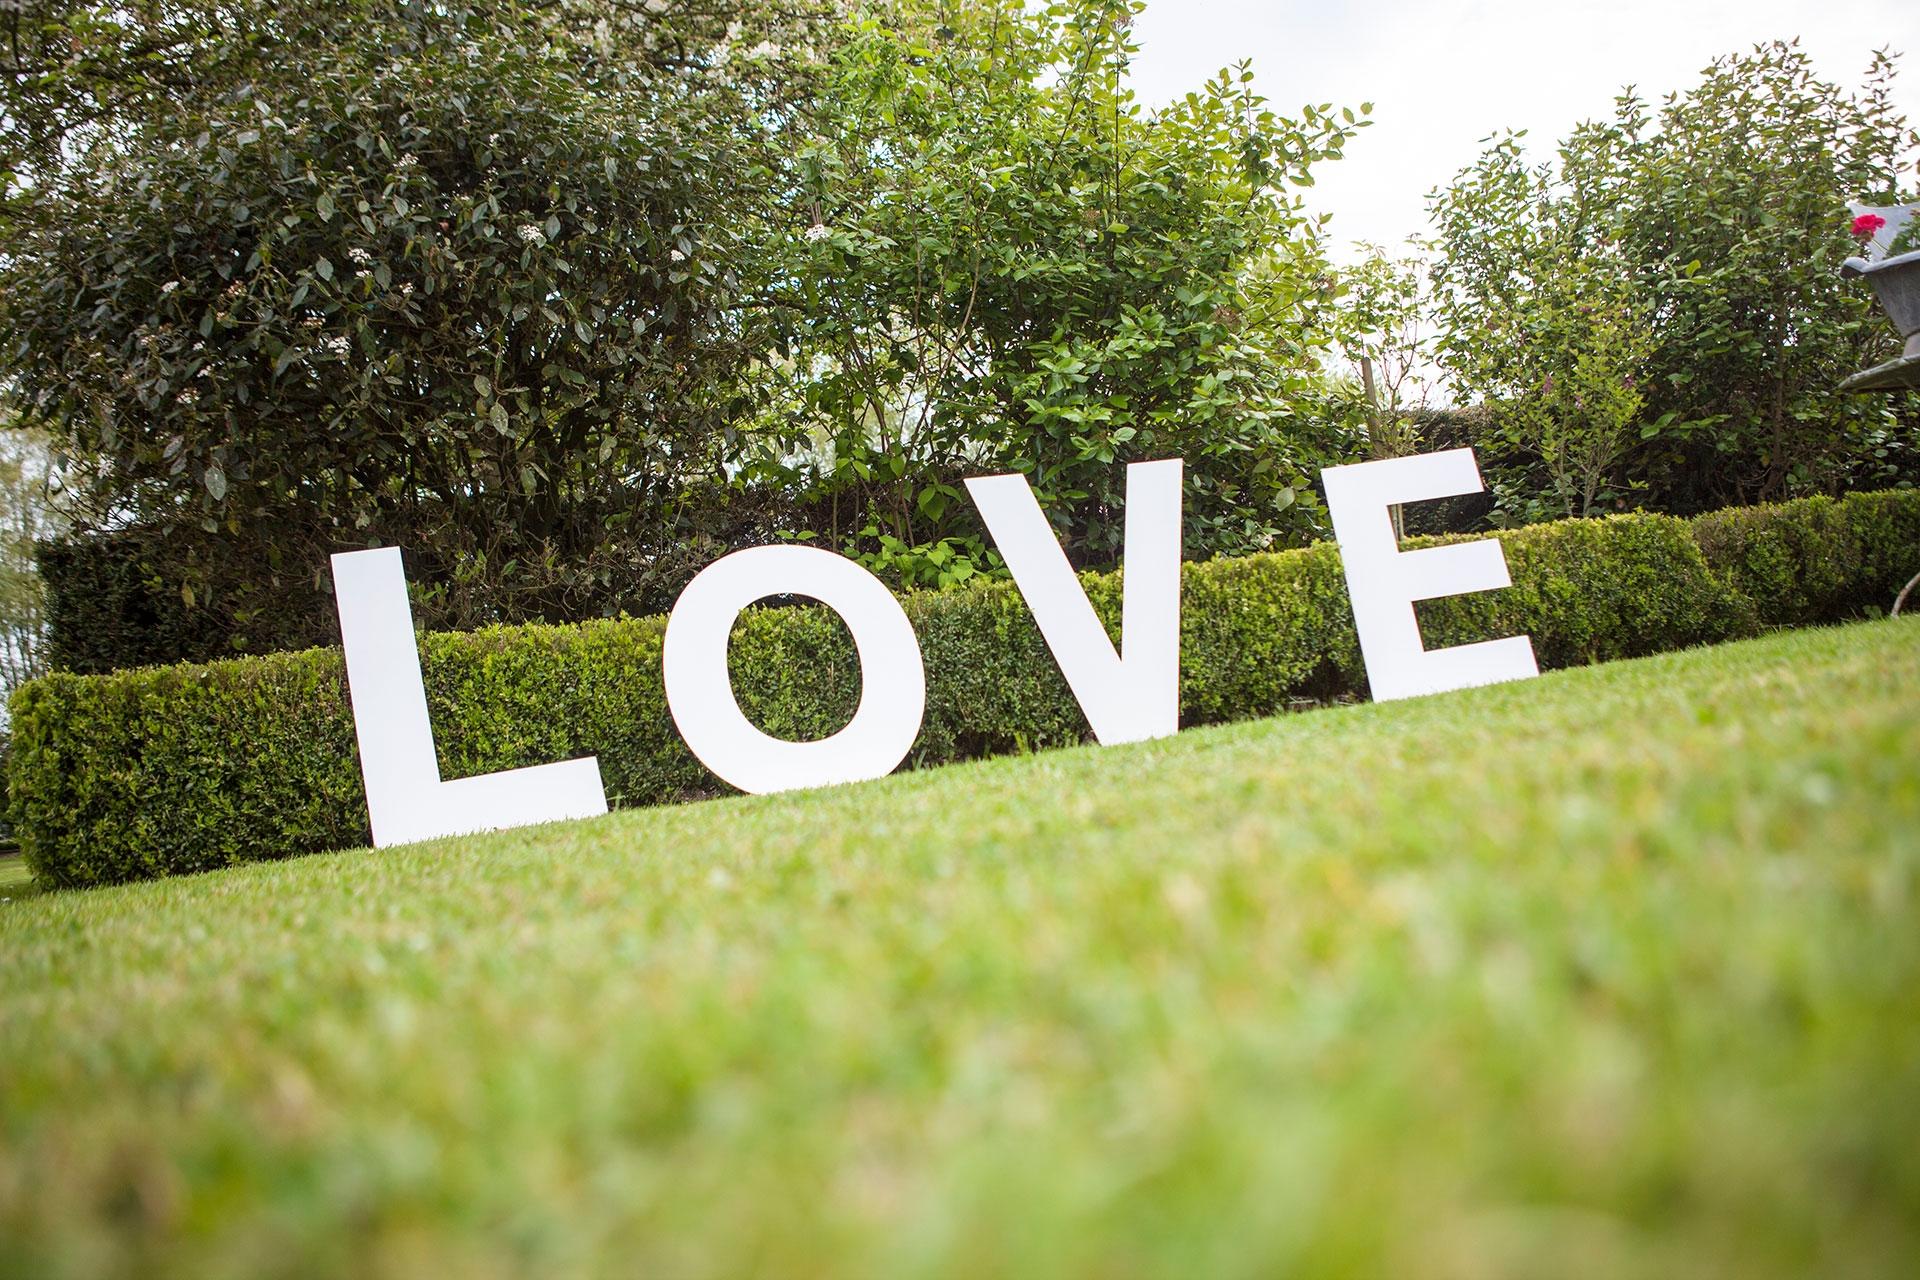 particuliers-evenements-mariages-oui-zelie&valentin-40